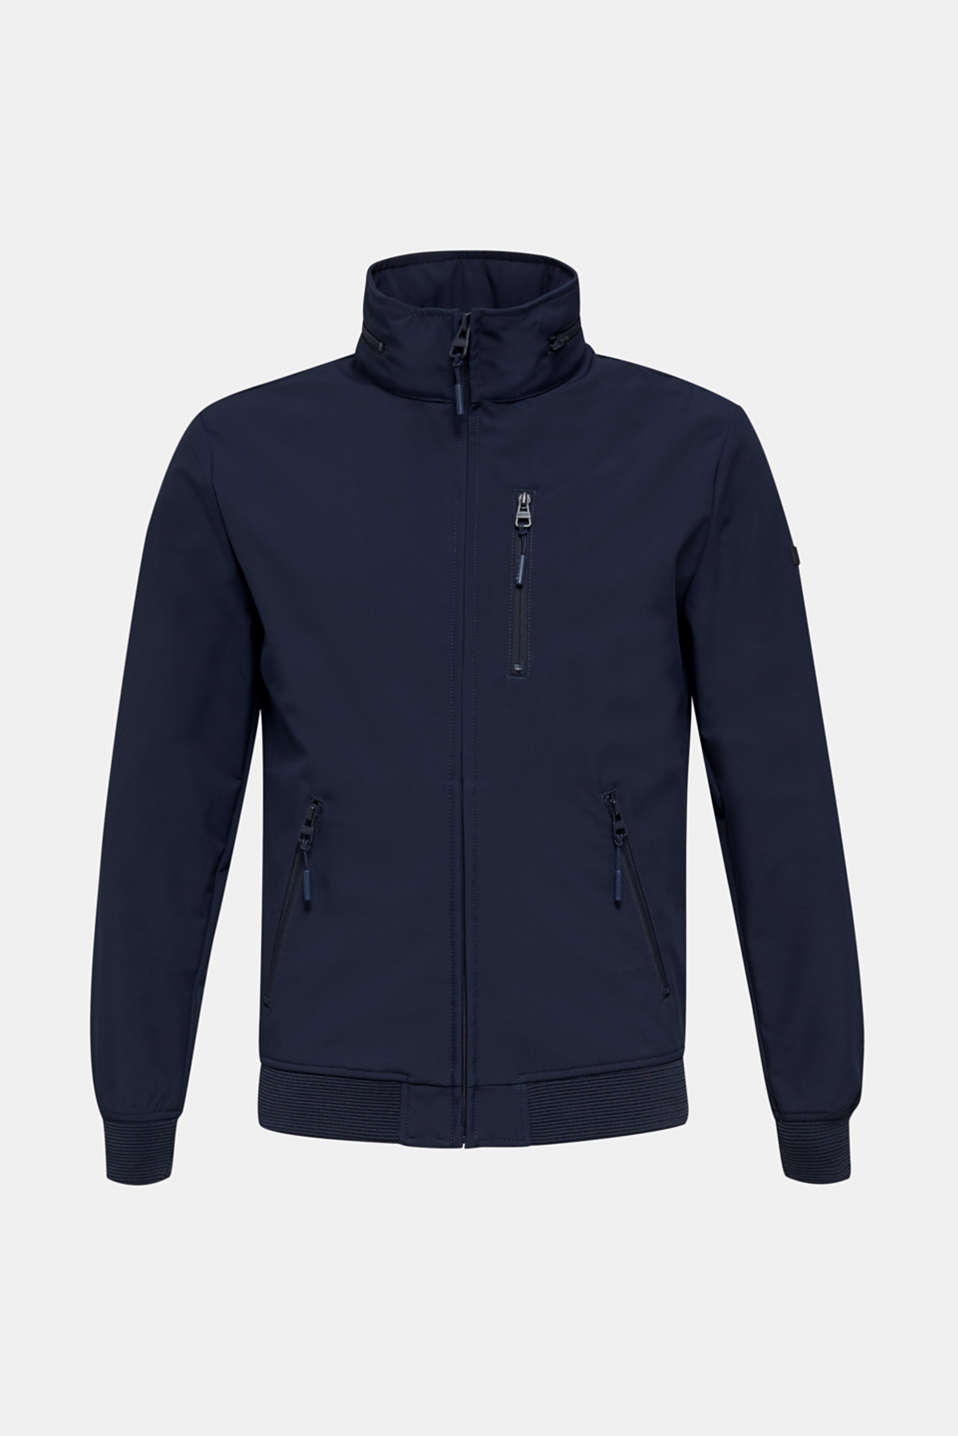 Outdoor jacket with an adjustable hood, DARK BLUE, detail image number 8